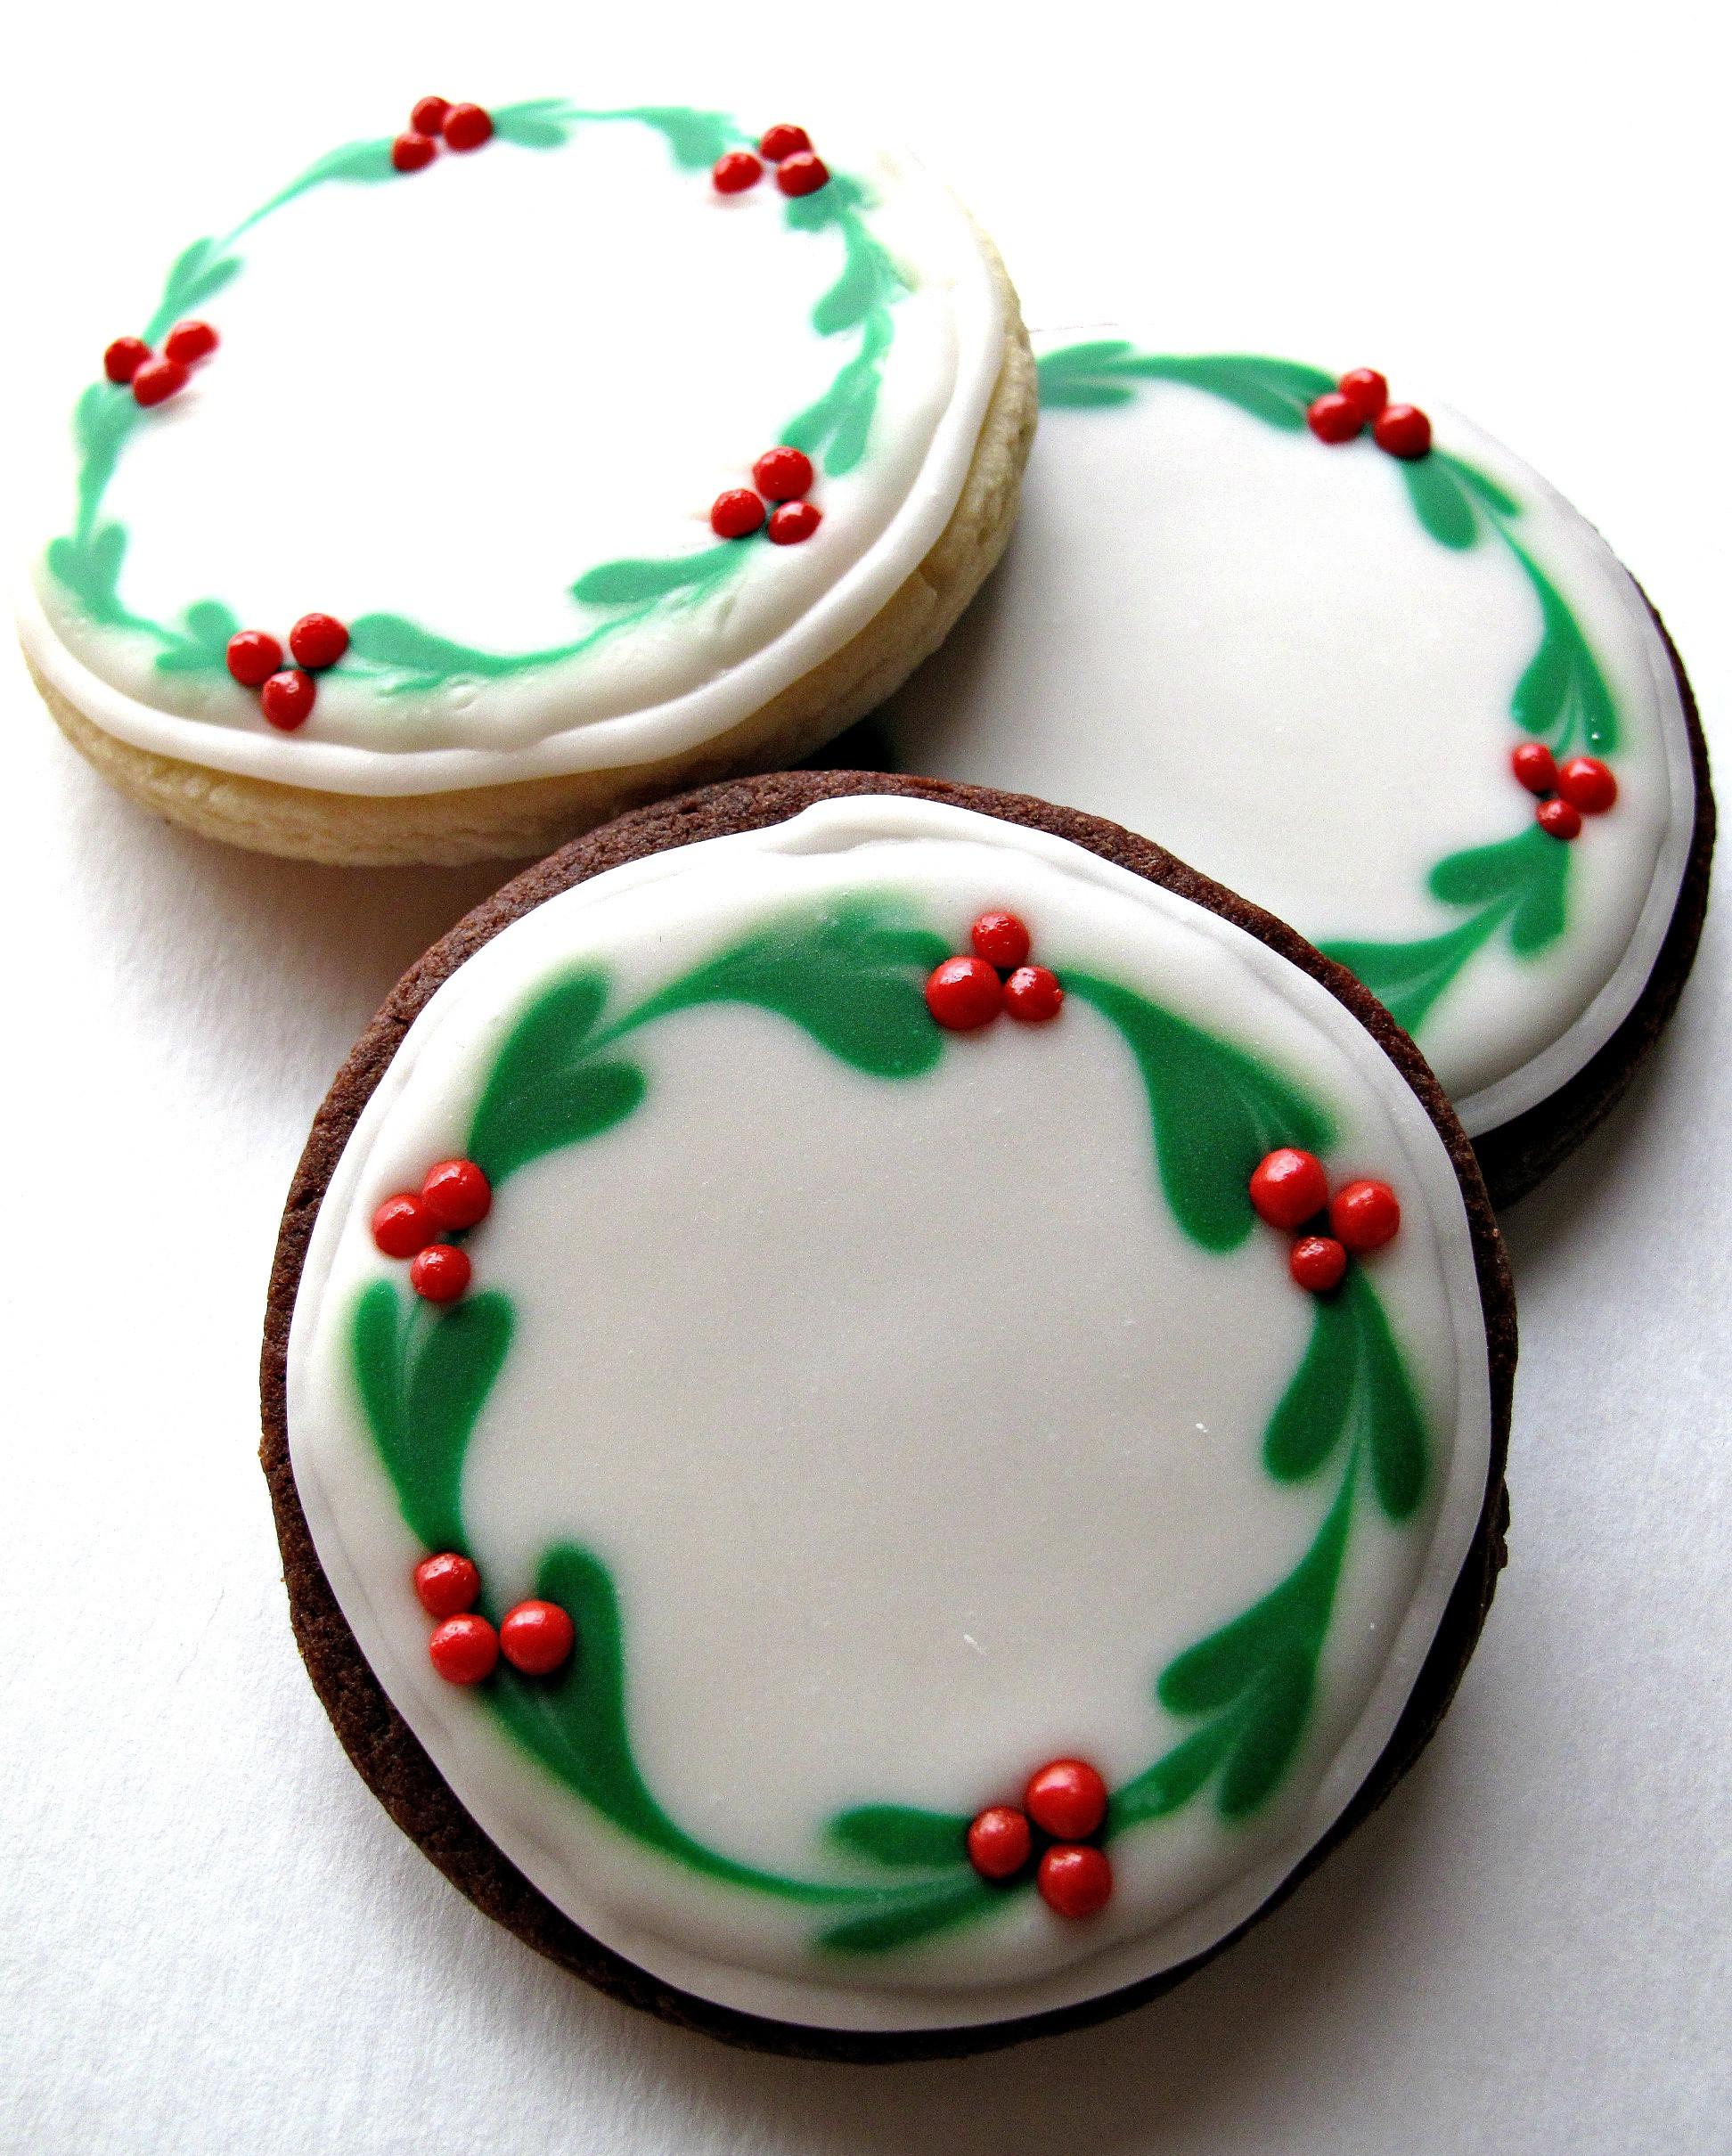 Iced Christmas Cookies  Chocolate Covered Oreos and Iced Christmas Sugar Cookies